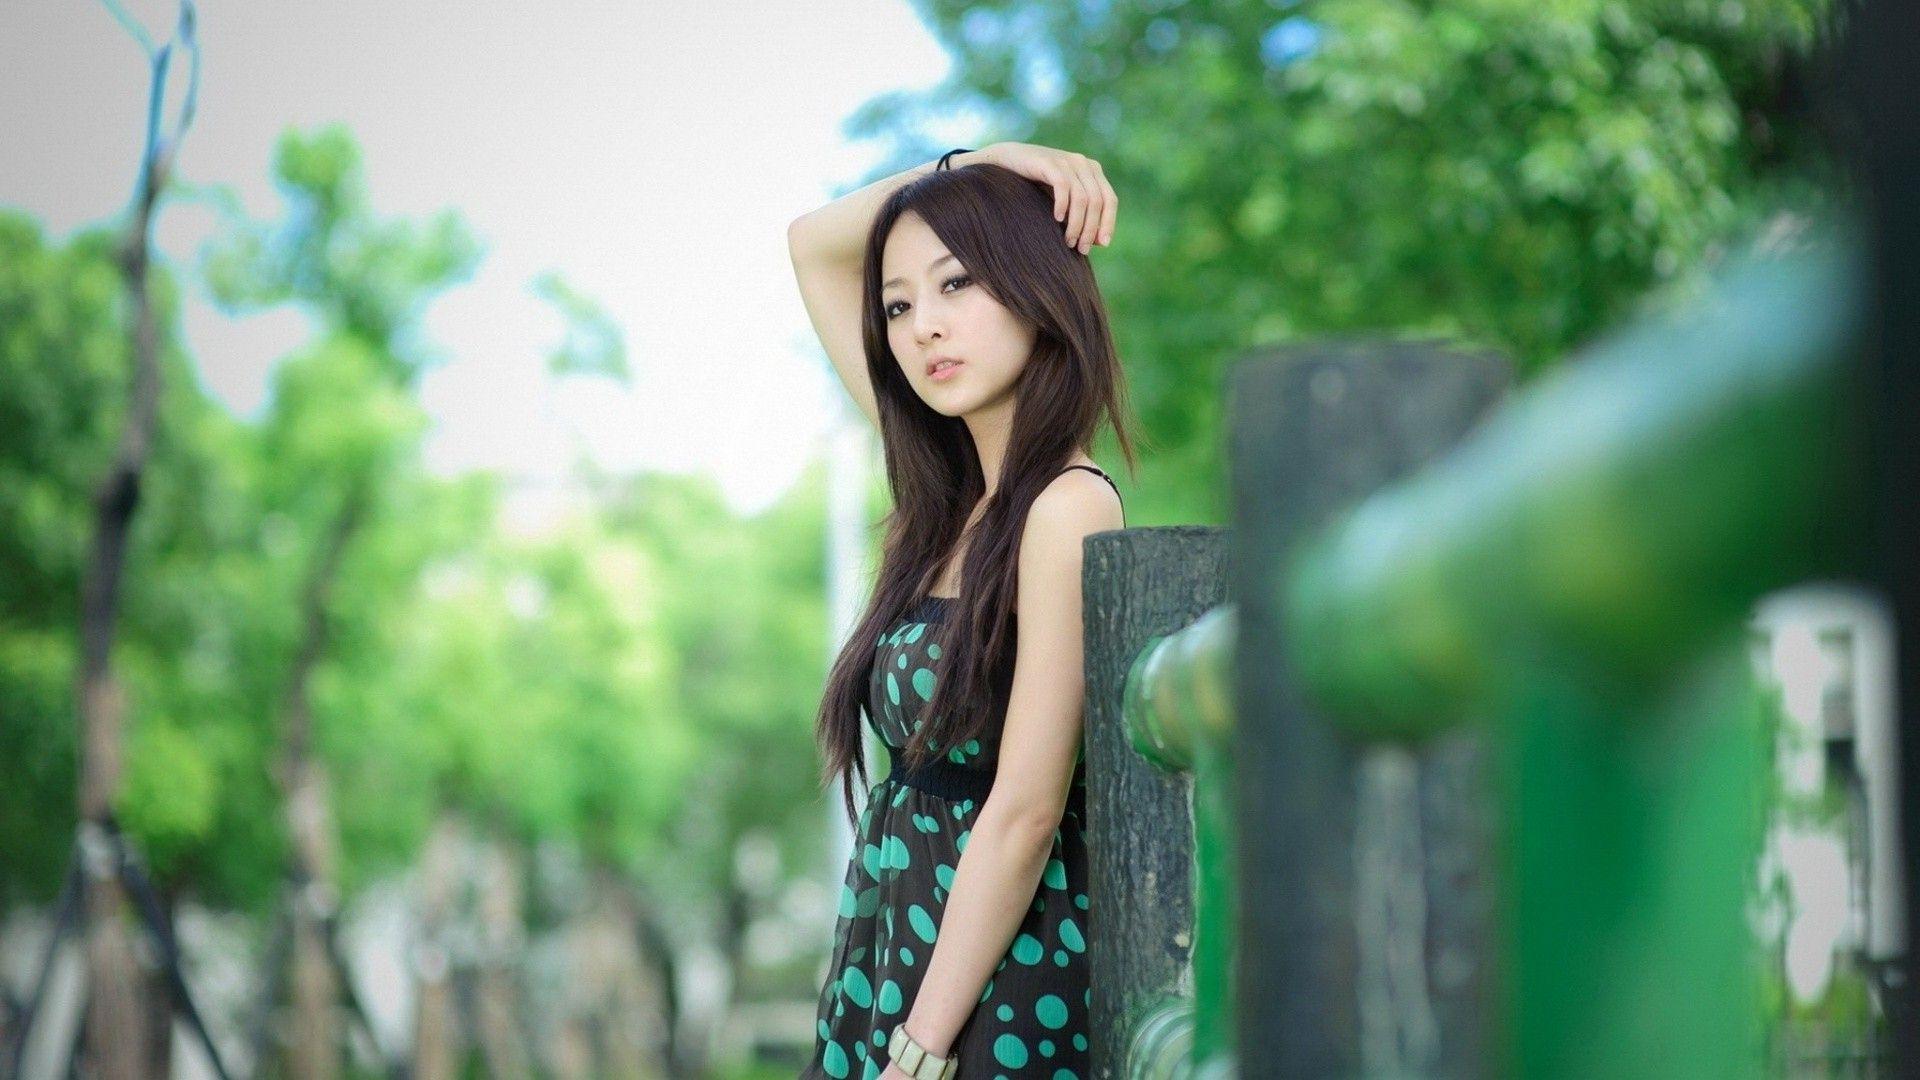 Mikako Zhang Kaijie Wallpaper 9277 1920x1080